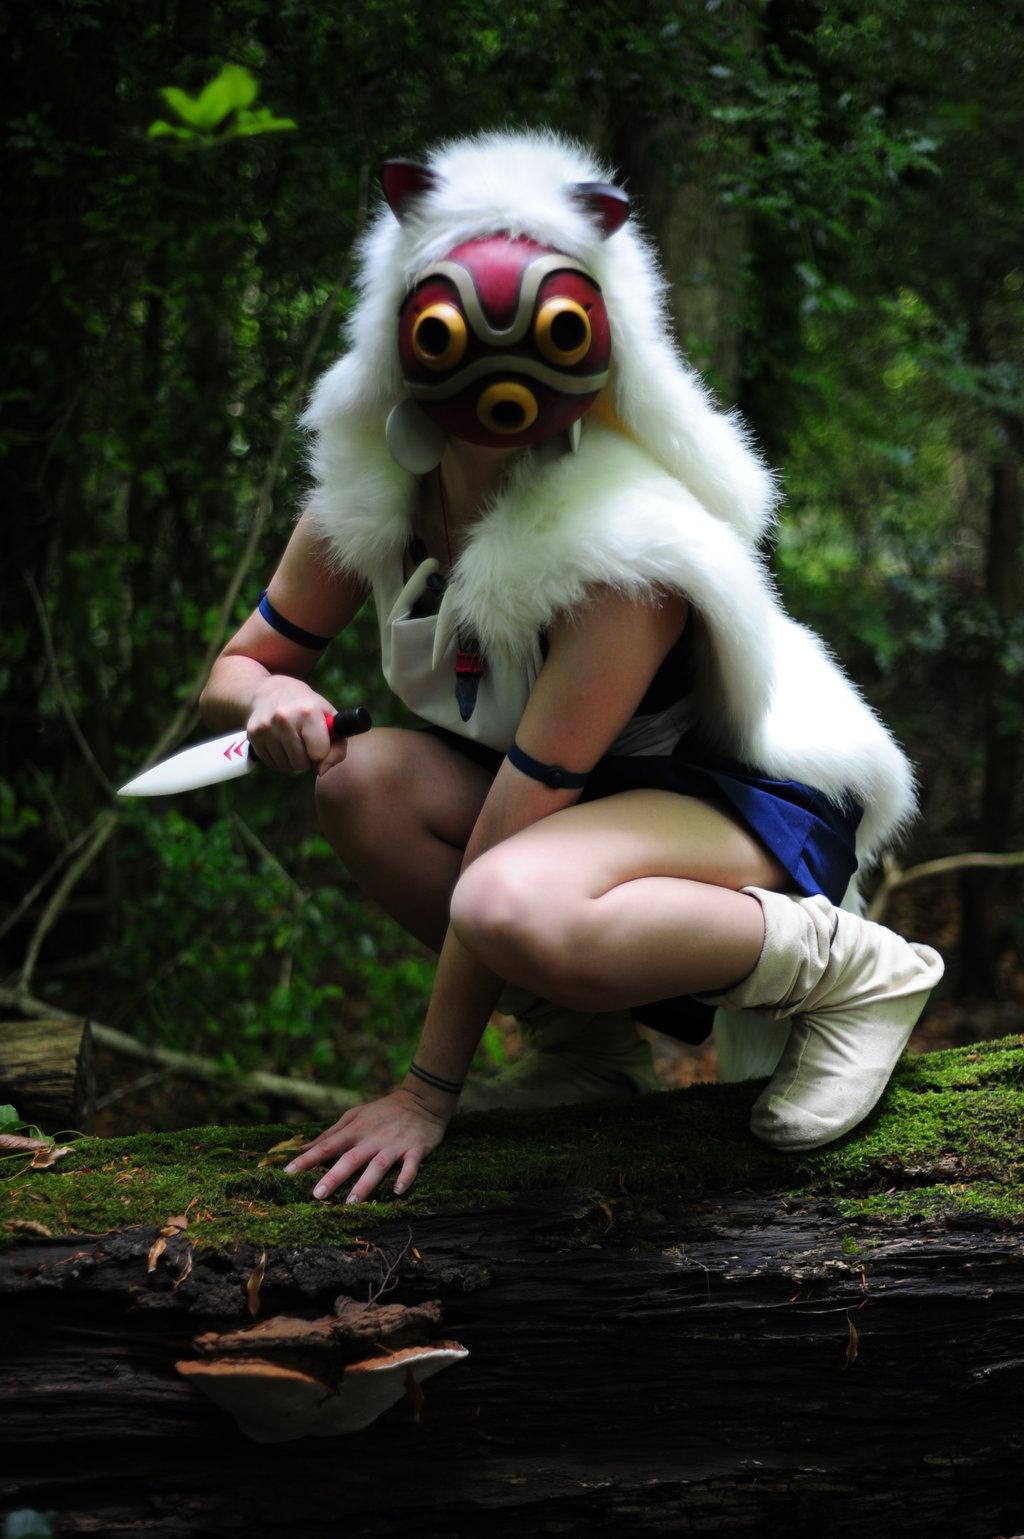 LauraNeocleous  is San / Princess Mononoke | Photo by Violet